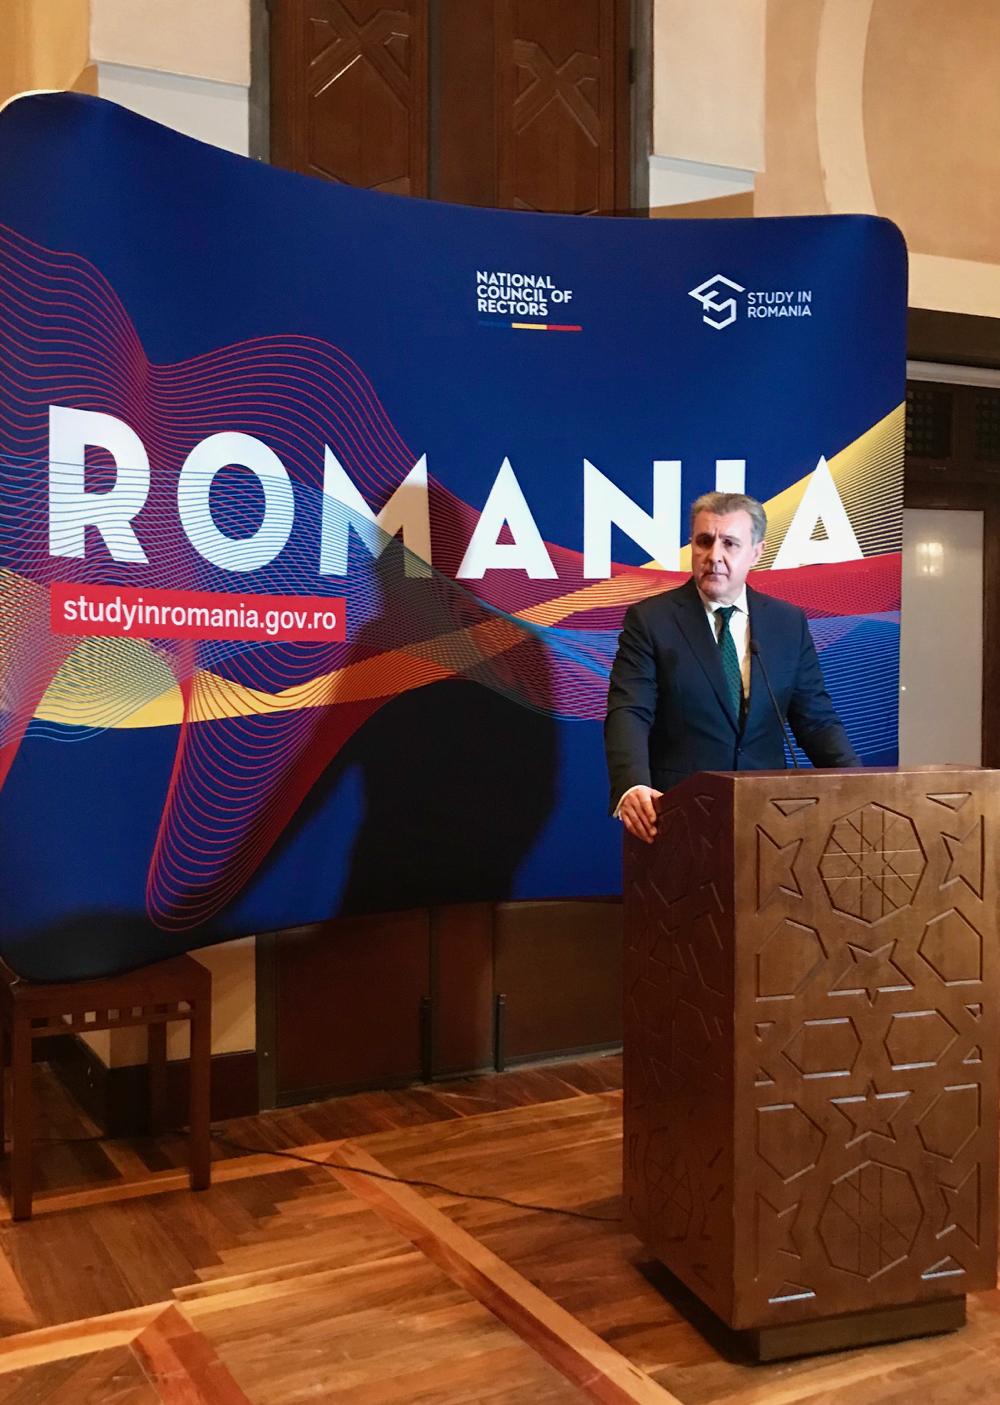 Principele-Radu-la-Seara-dedicata-universitatilor-din-Romania-la-Centrul-Ismaelit-din-Dubai-28feb2018-G